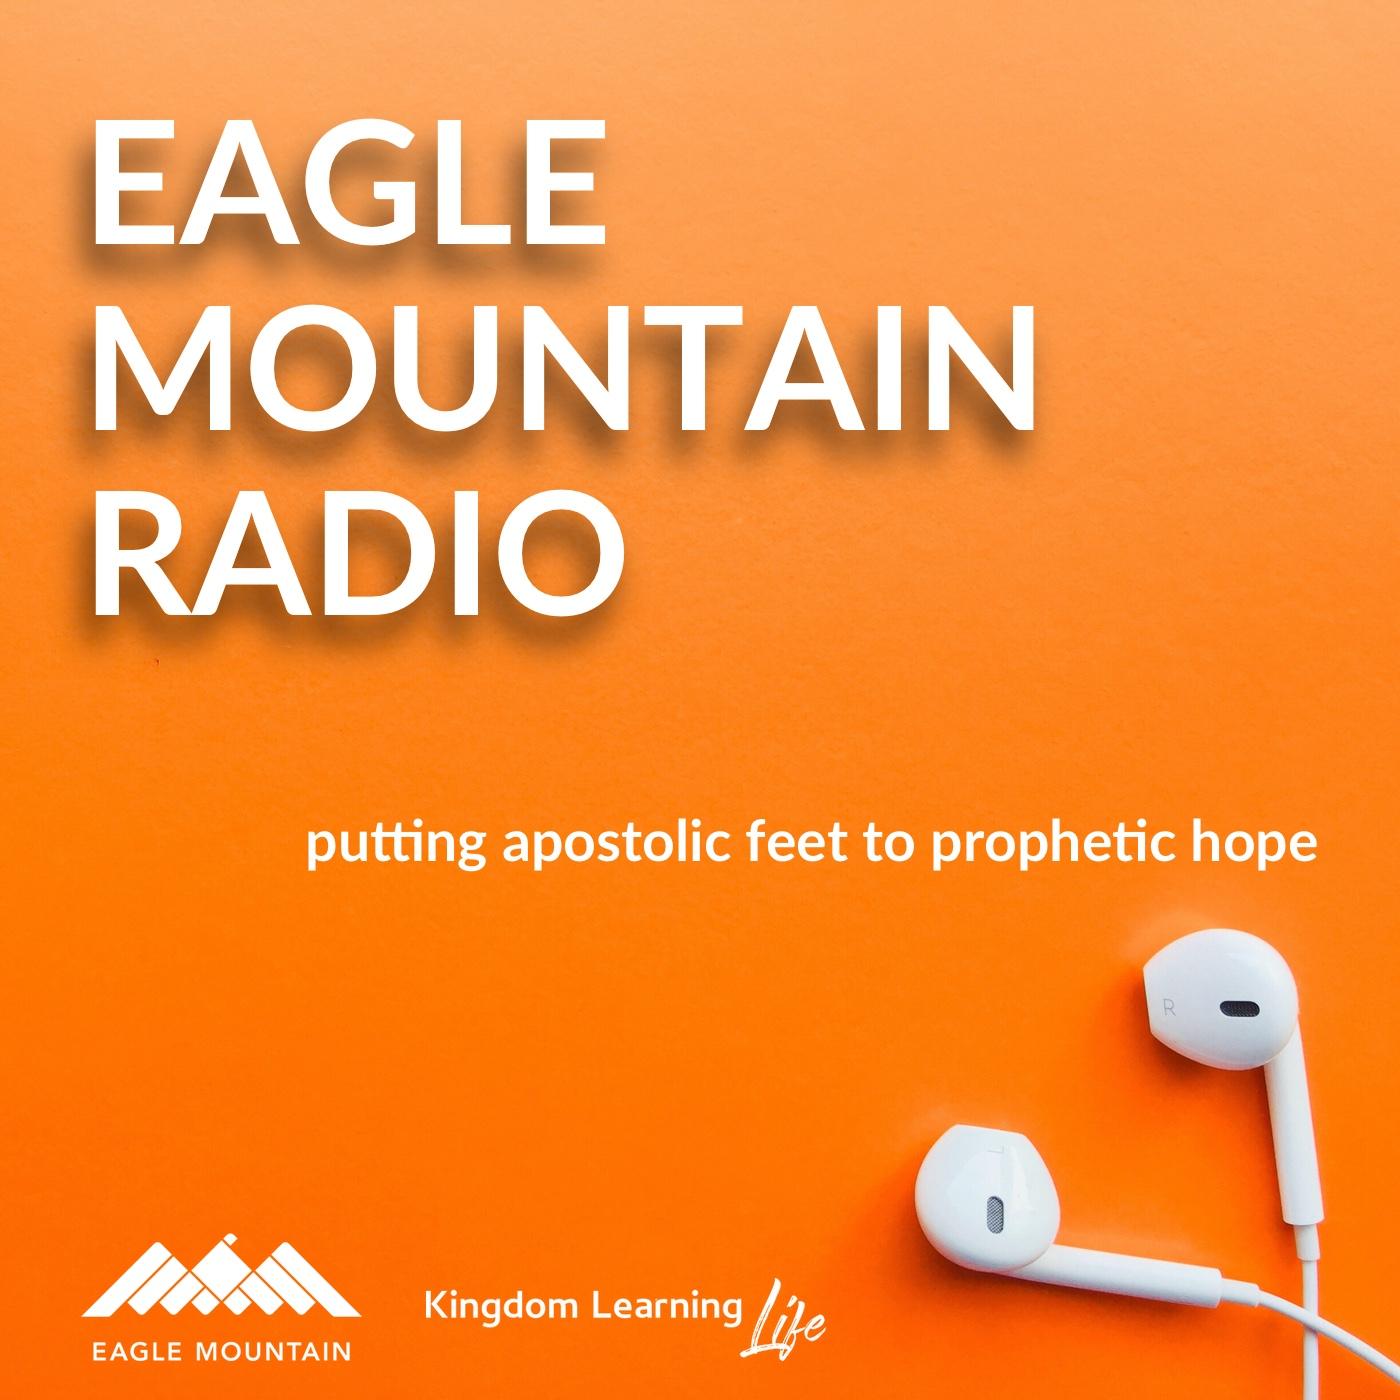 Eagle Mountain Radio